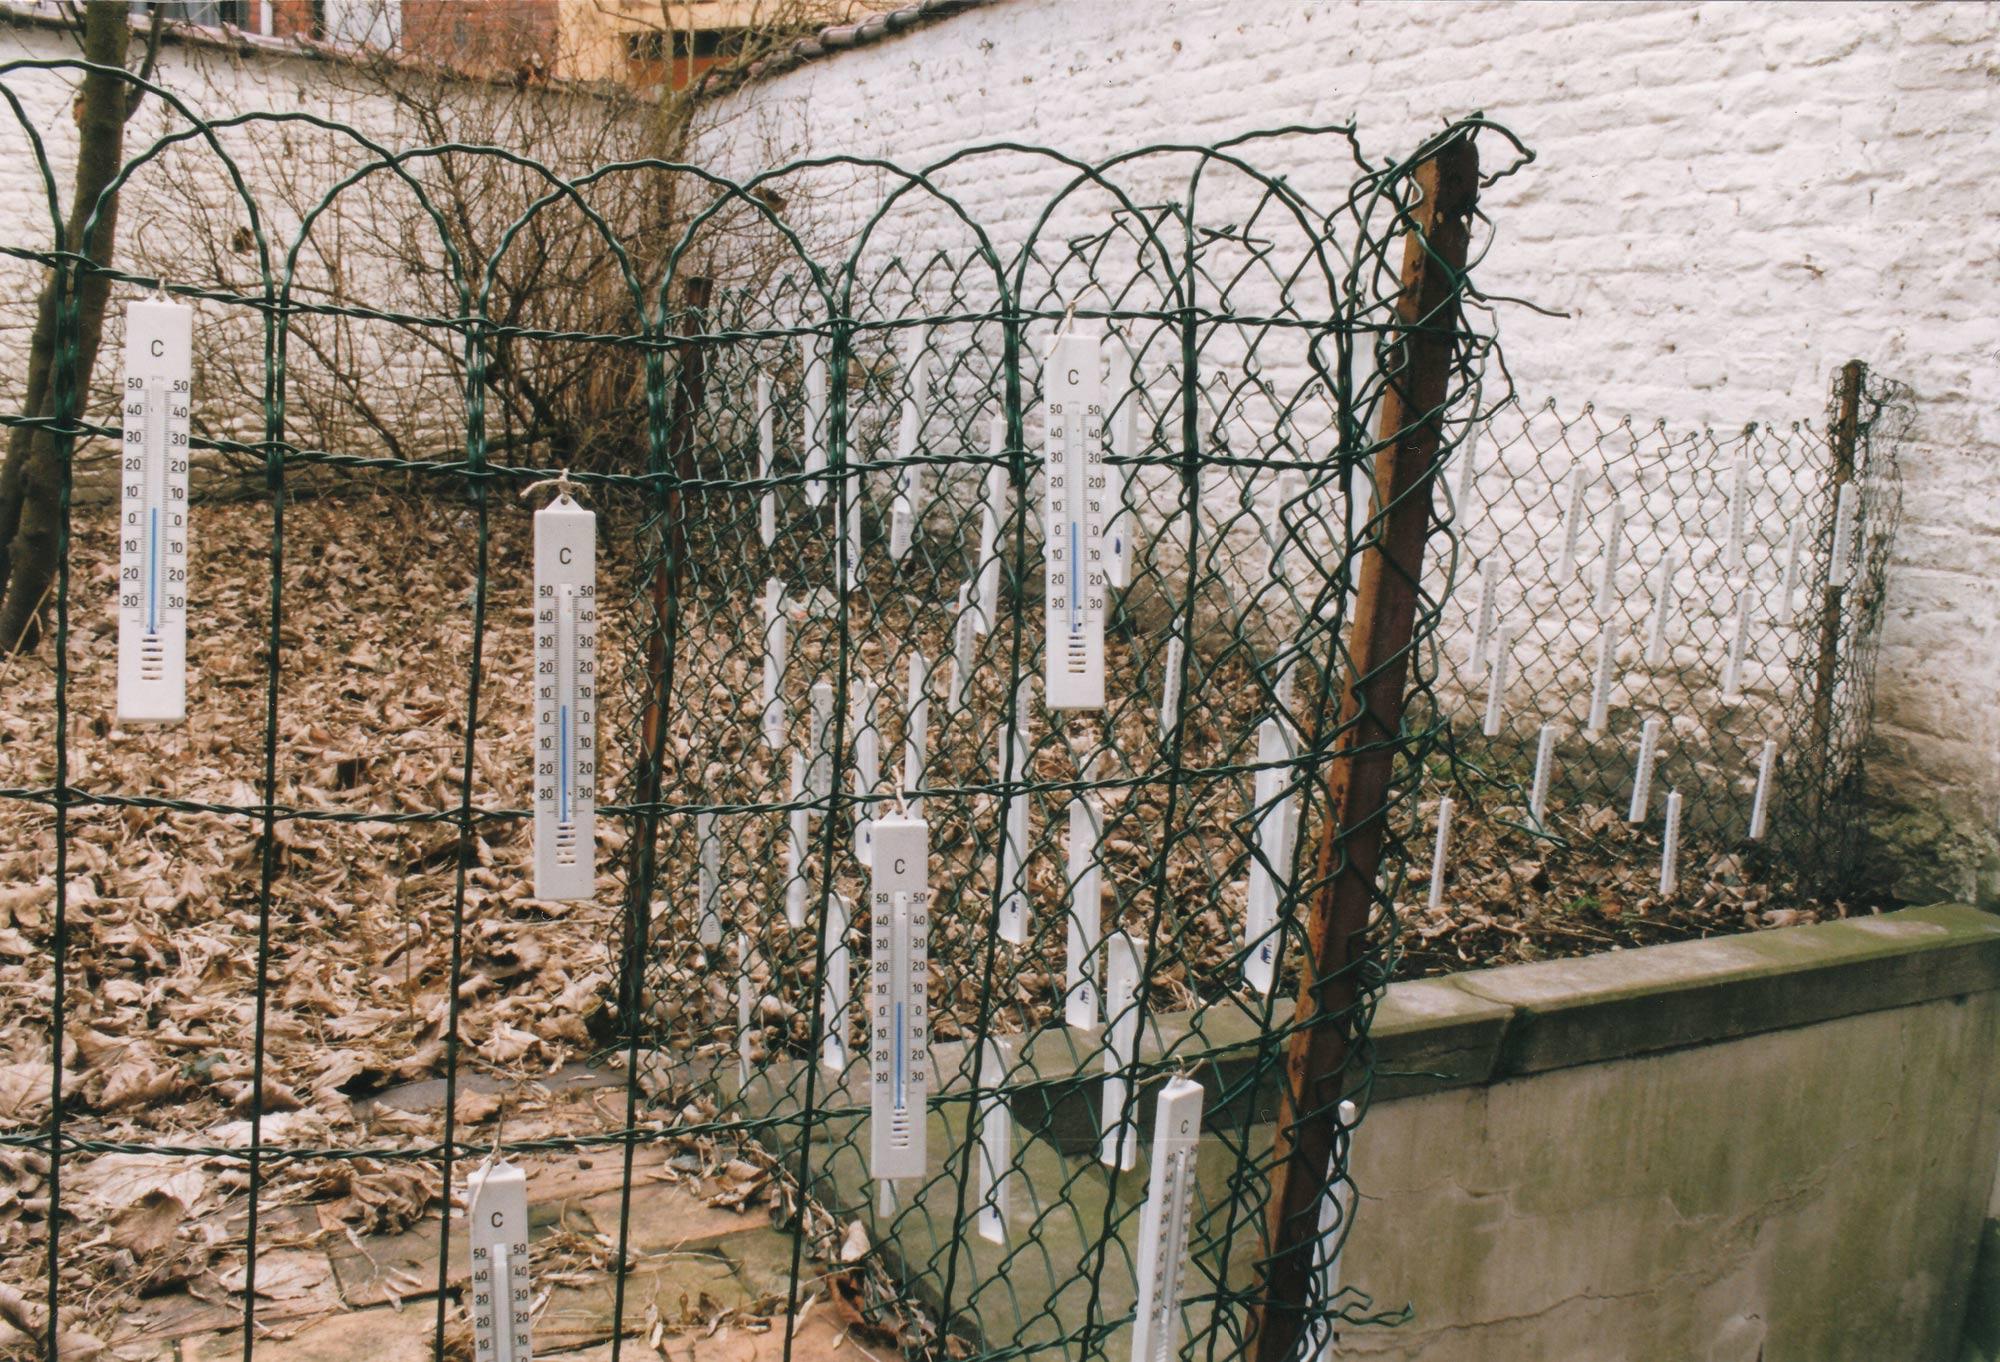 maarten-greve-thermometers-in-my-backyard